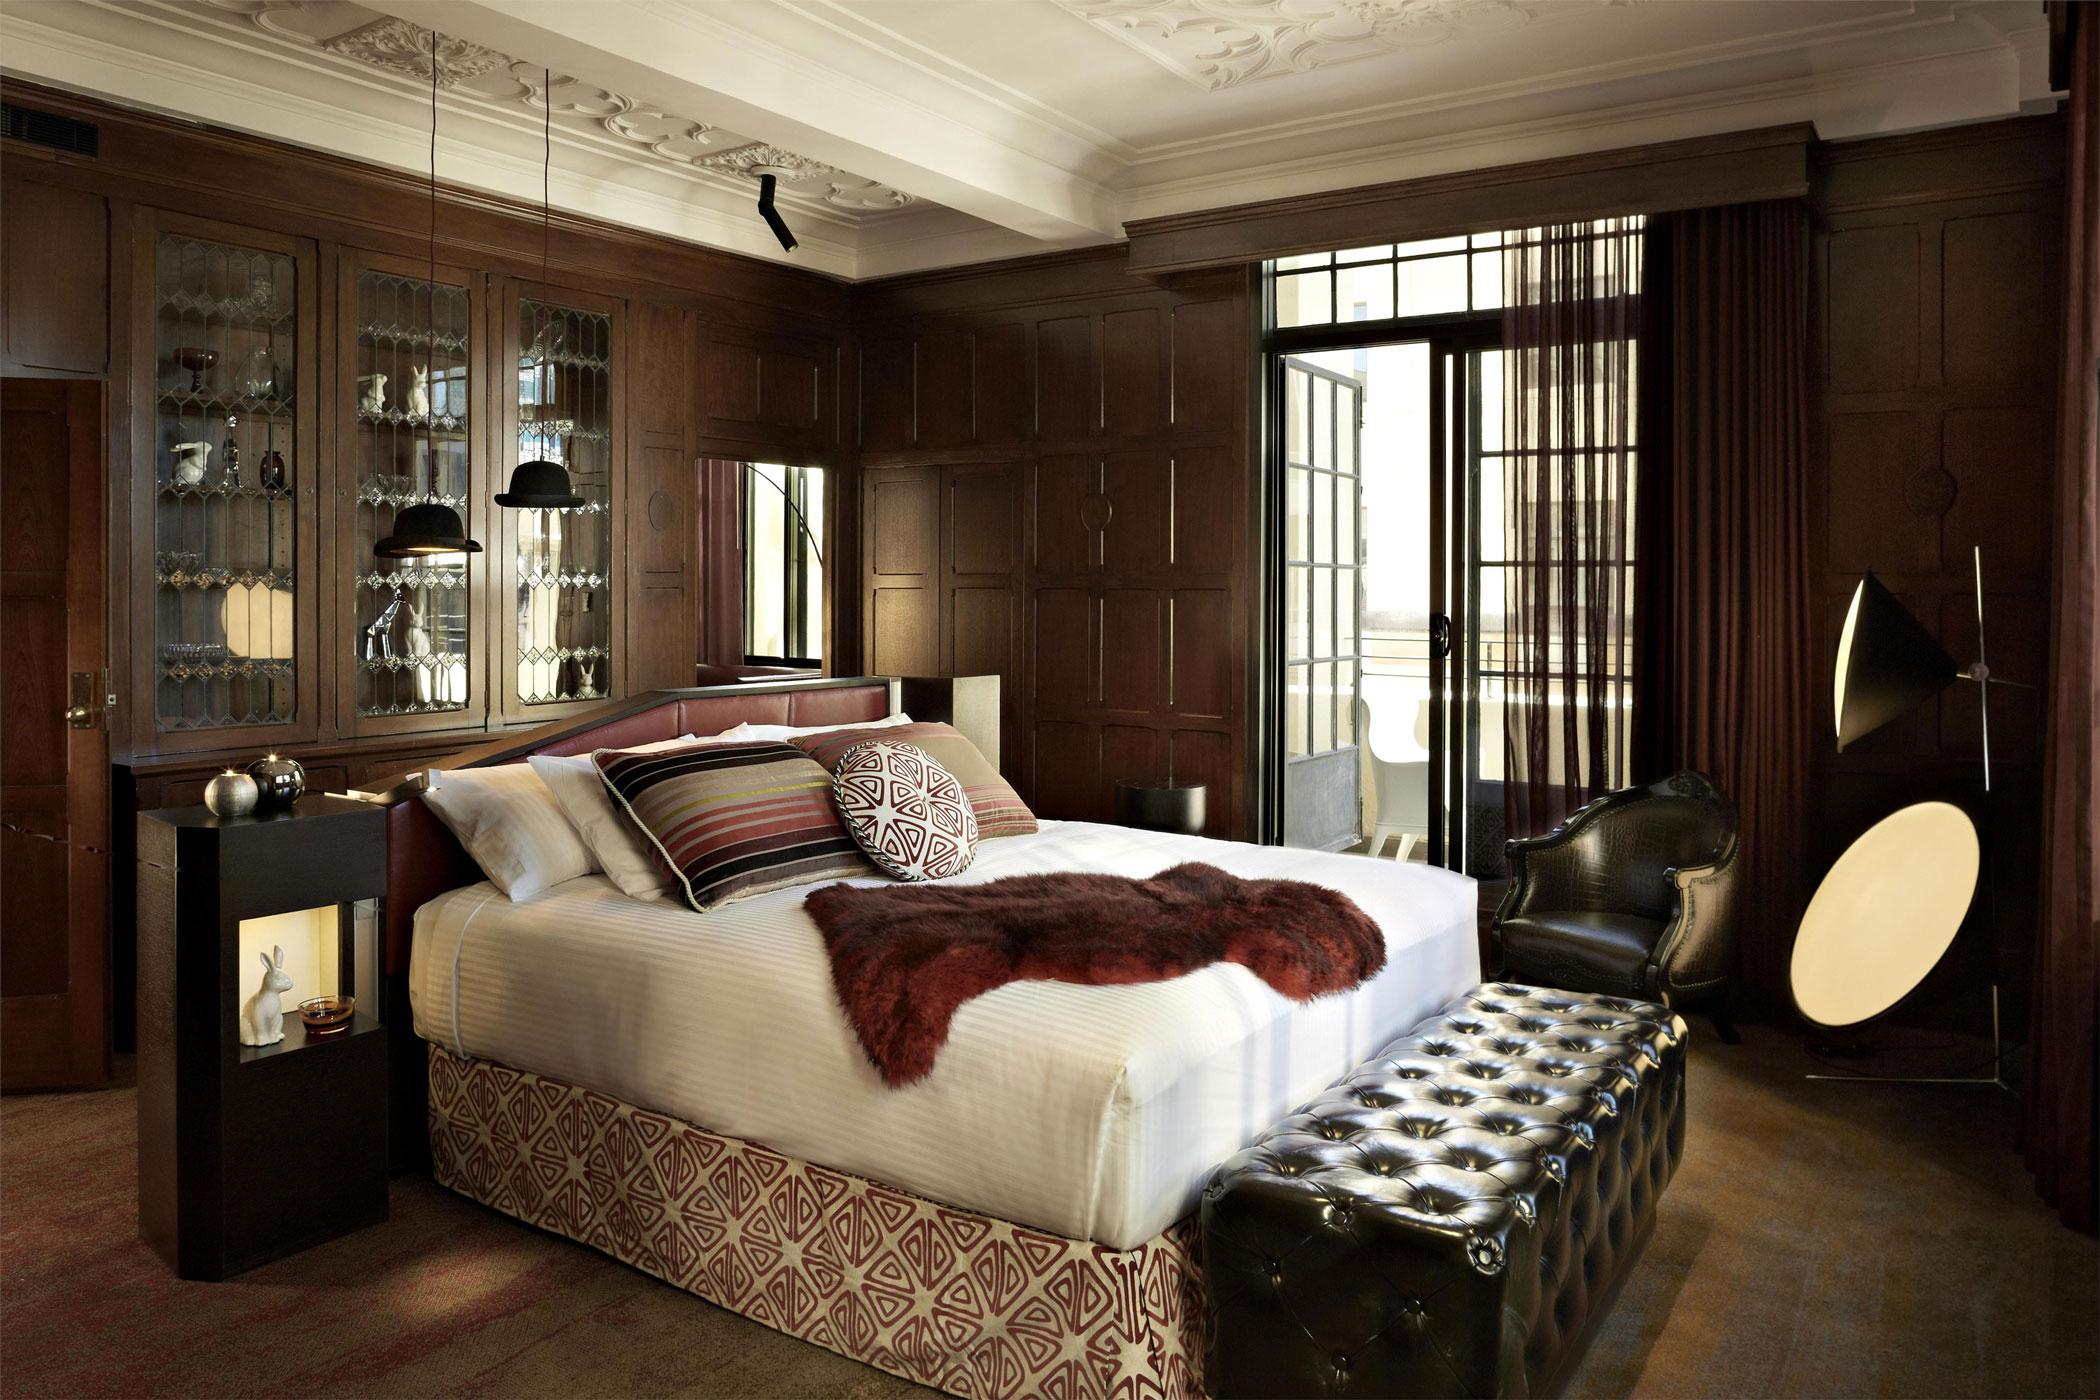 Full Size of Schlafzimmer Komplett Modern Massiv Luxus Weiss Set Moderne Wohndesign Günstige Fototapete Komplette Romantische Tapeten Komplettes Deckenleuchte Wohnzimmer Wohnzimmer Schlafzimmer Komplett Modern